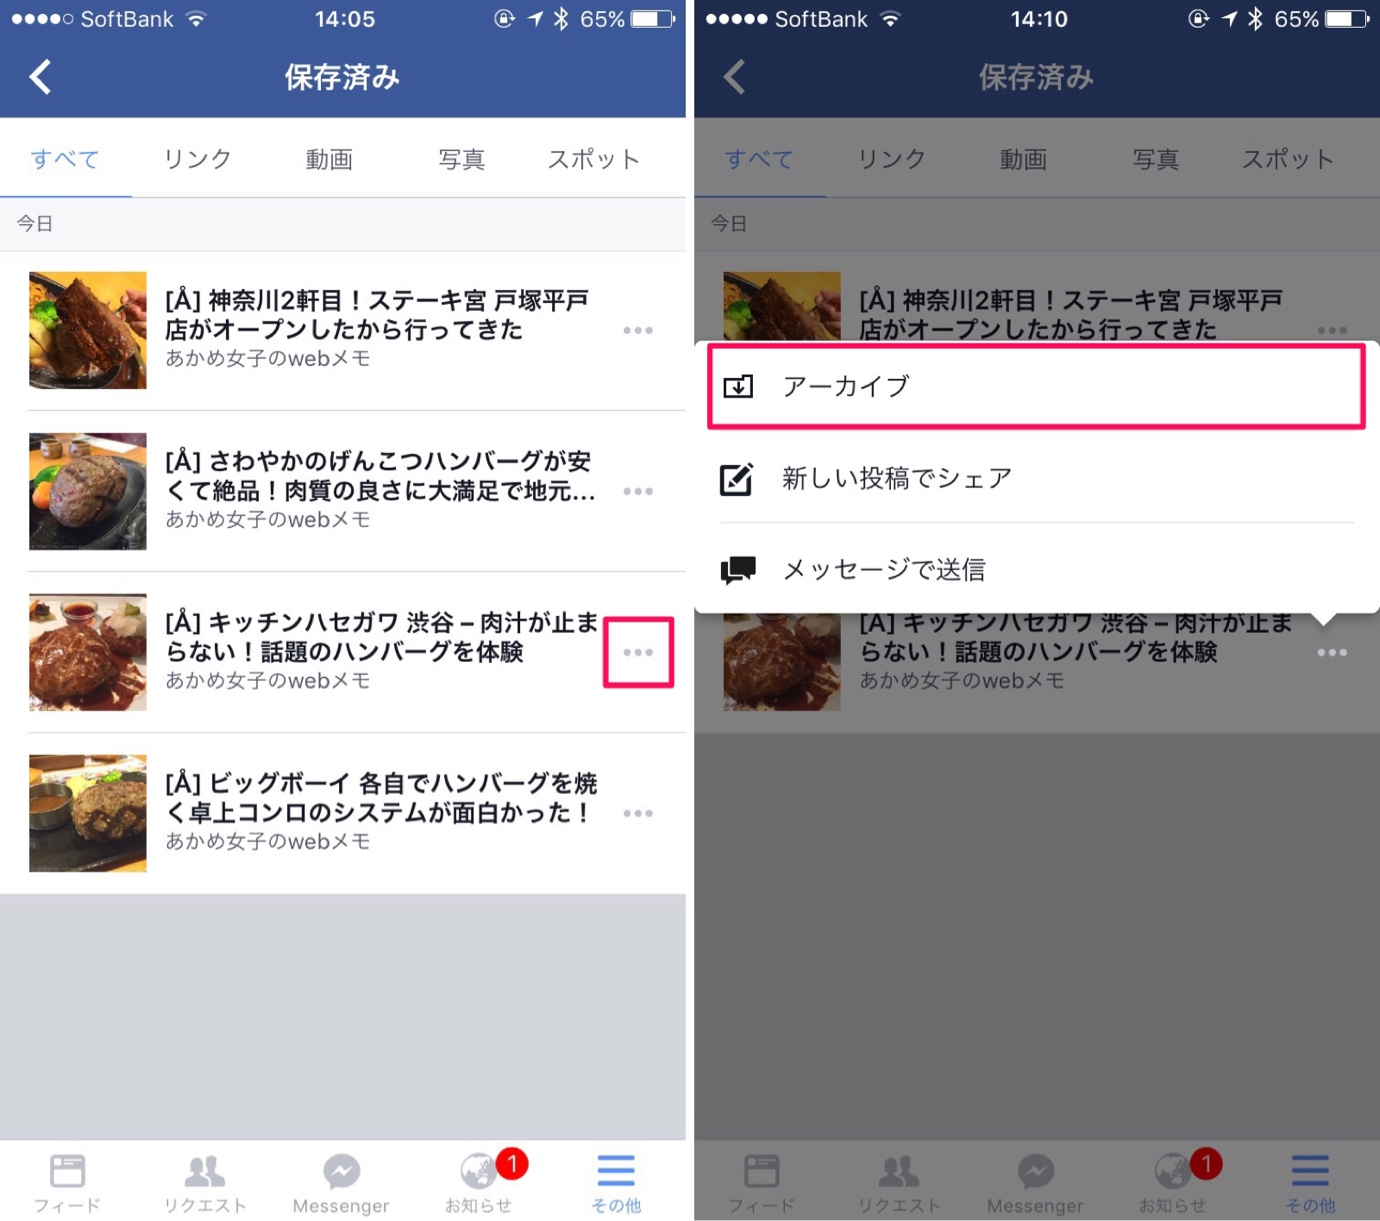 iPhoneのFacebookアプリから保存情報を削除する場合